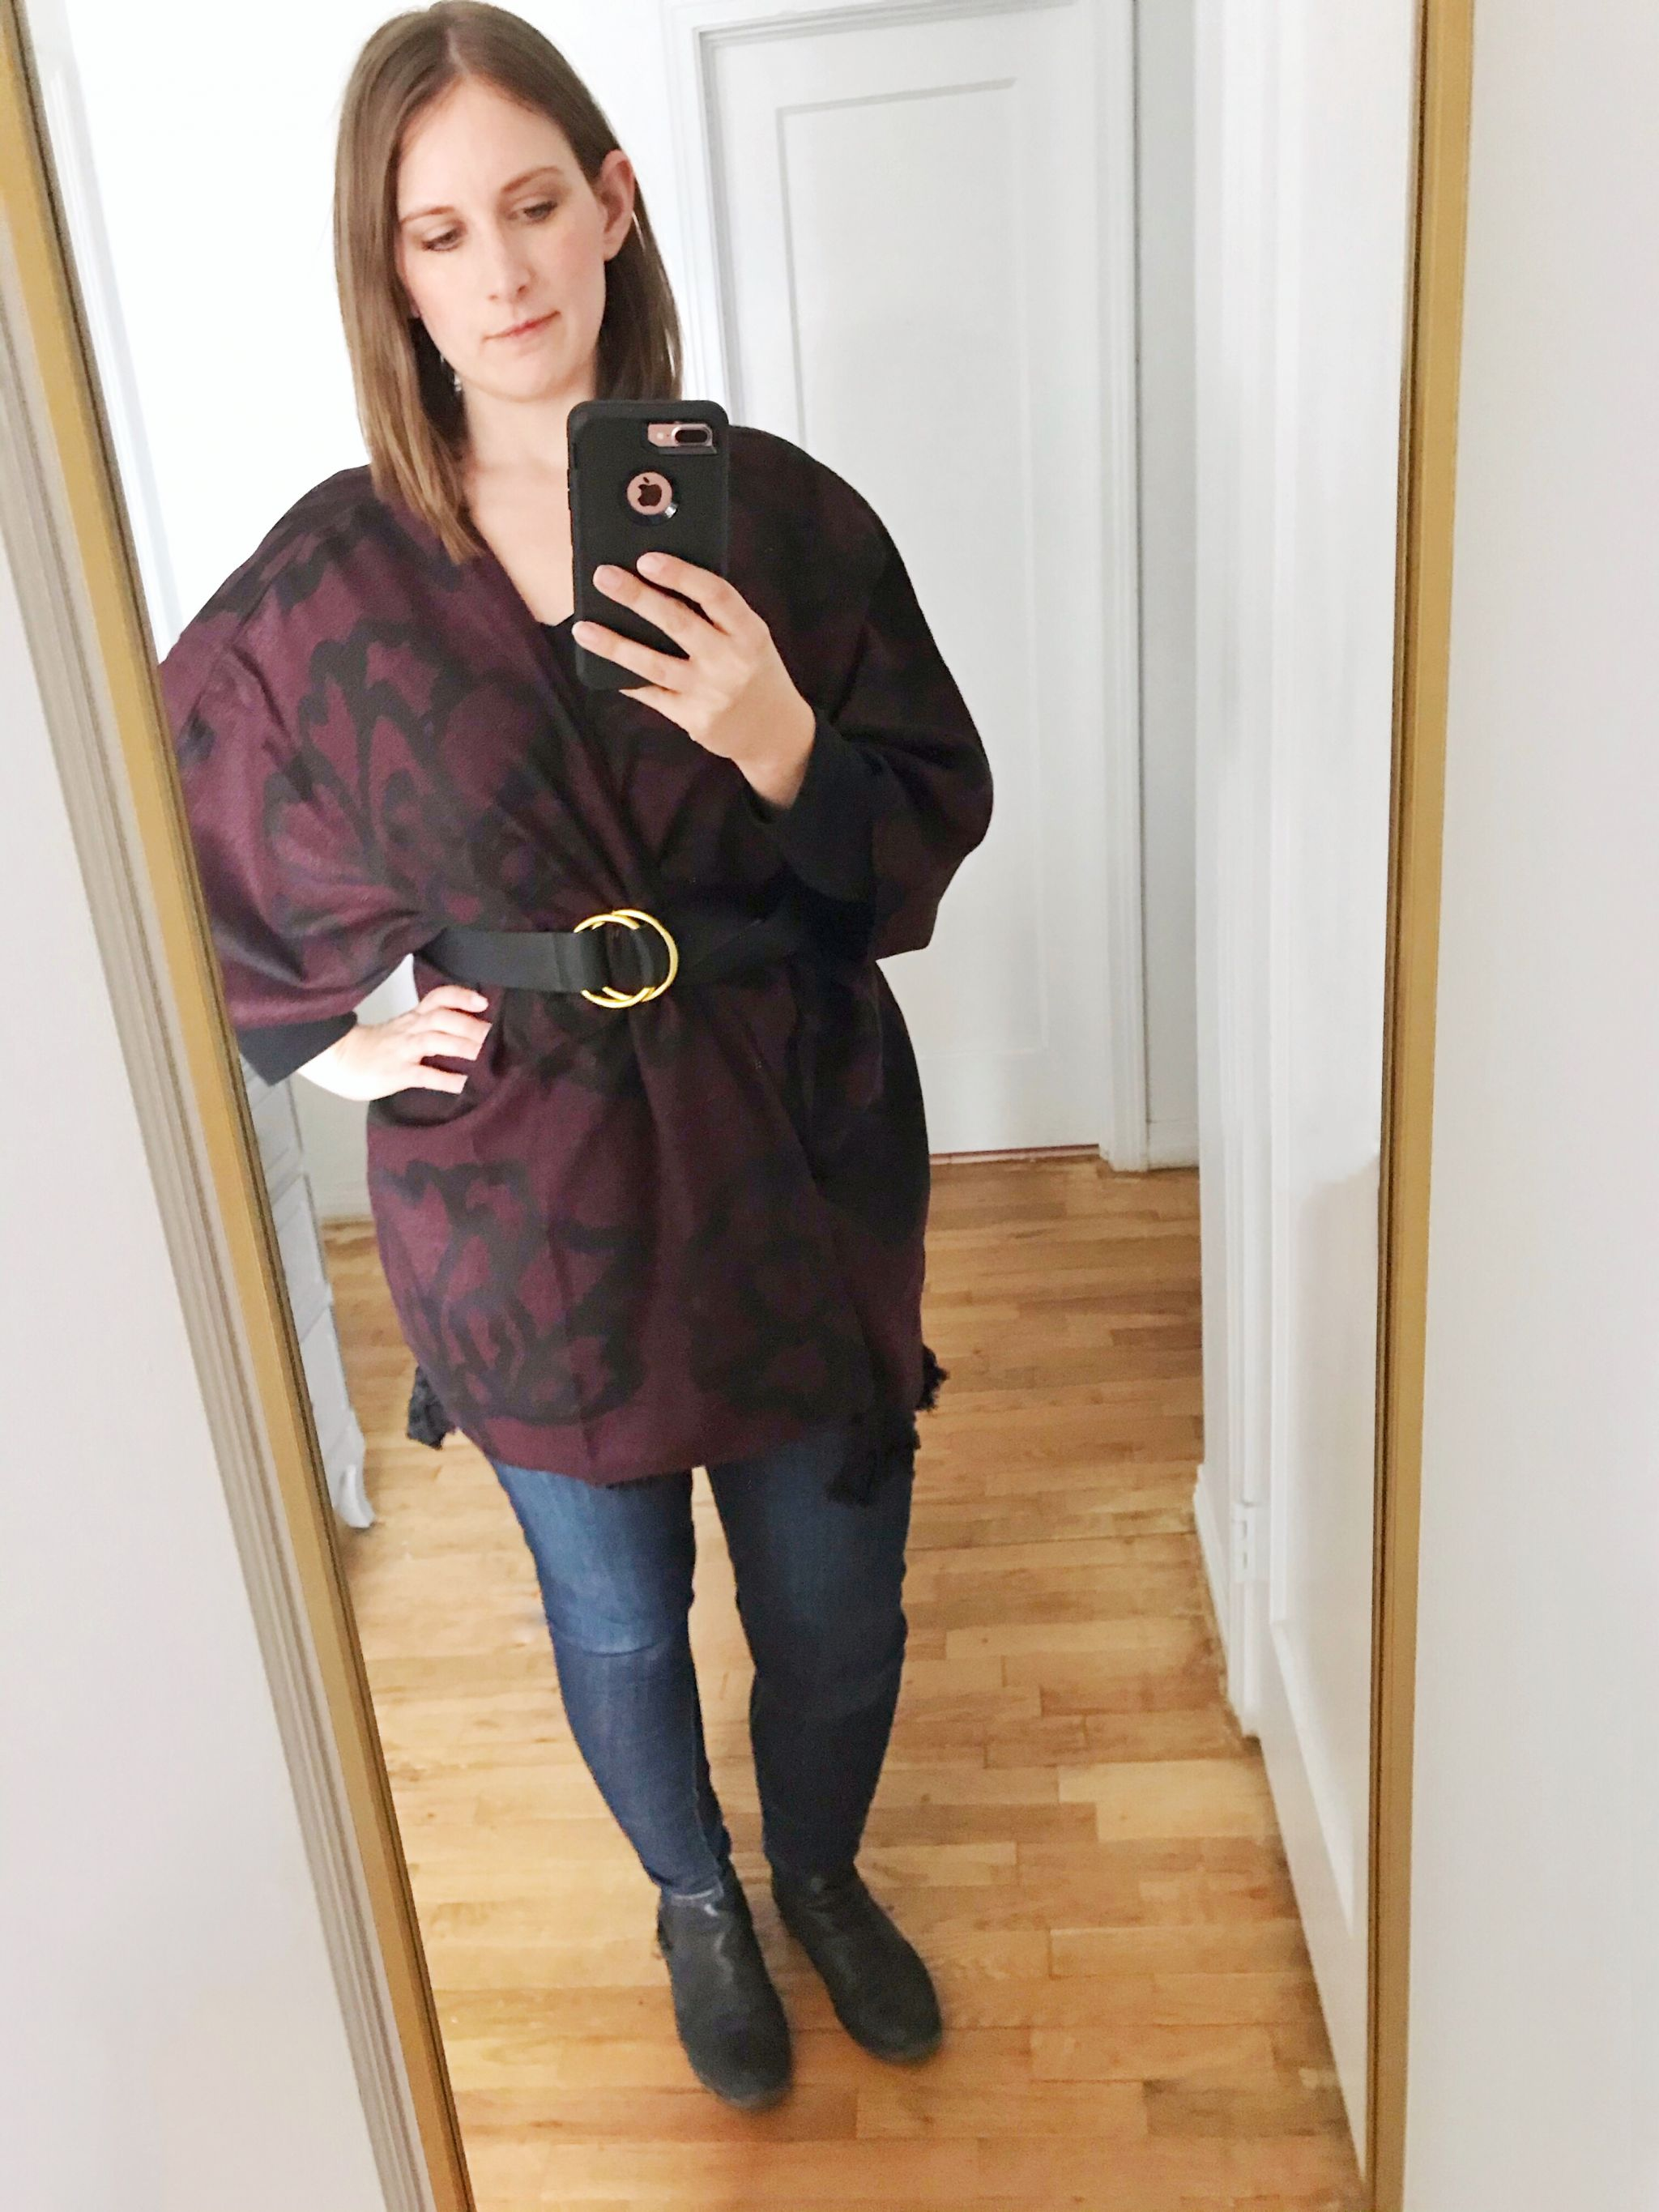 winter Rachel Zoe Box of Style cardigan and belt